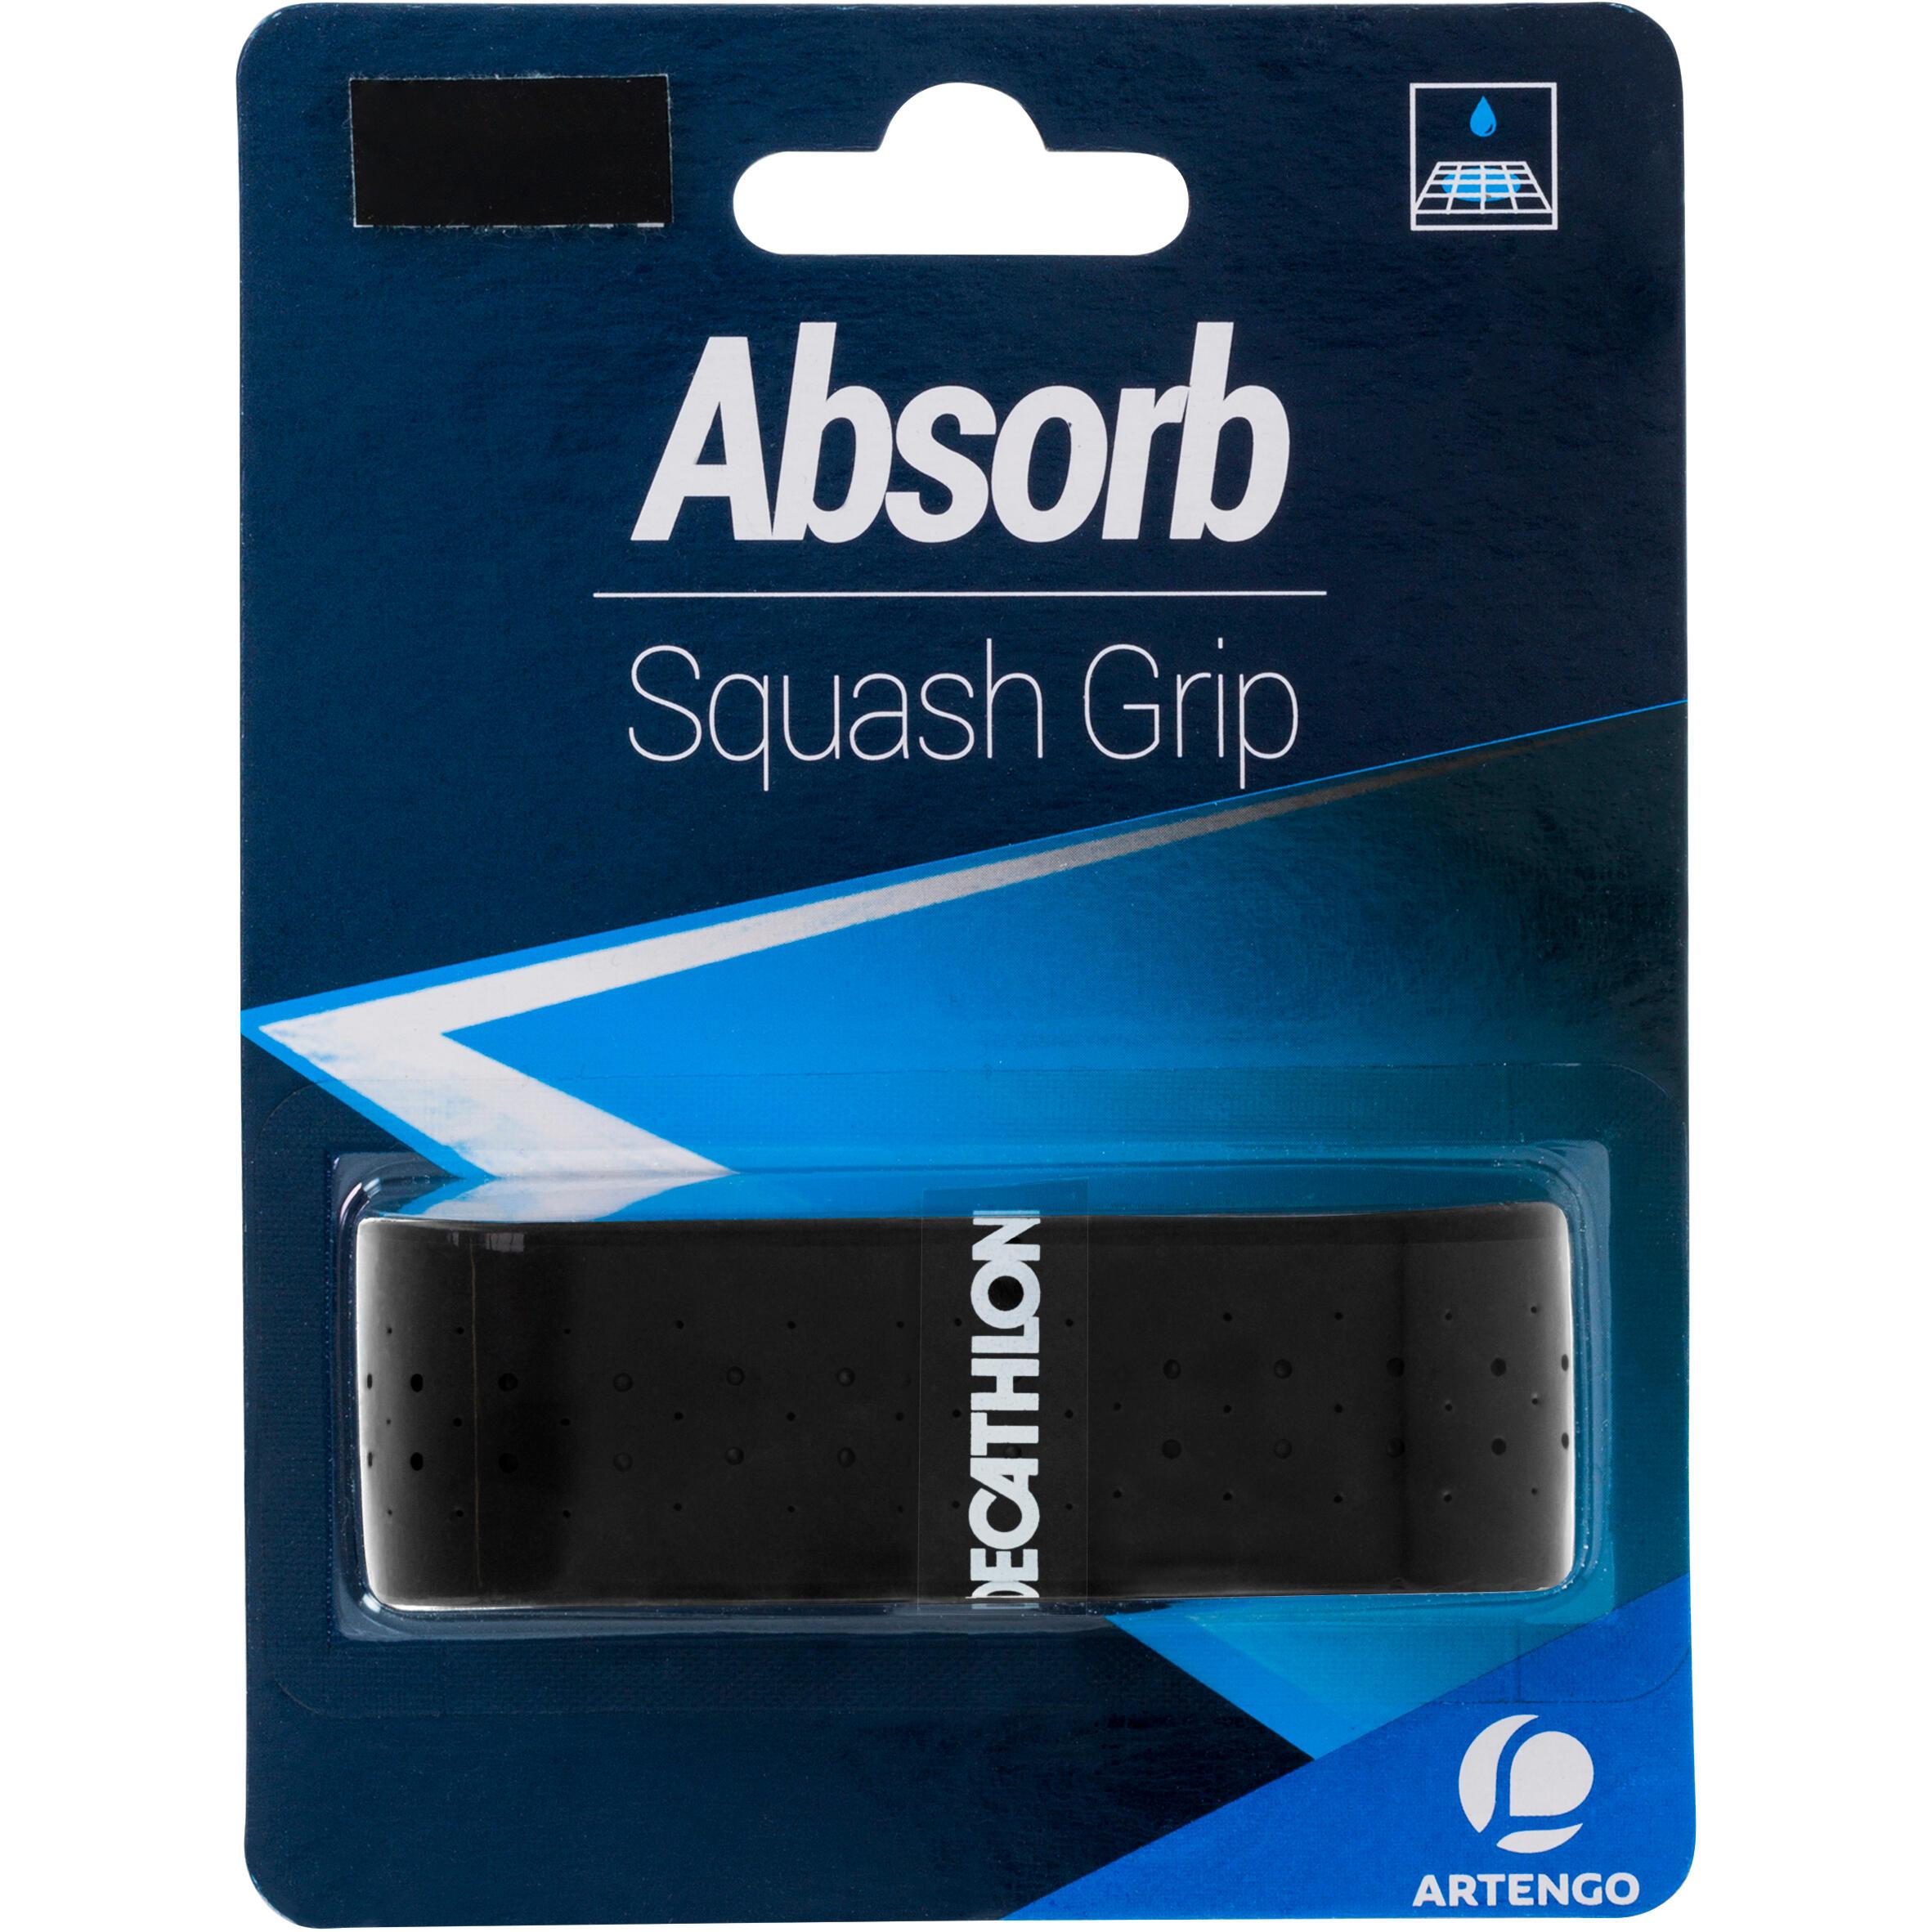 Absorb Squash Grip - Black